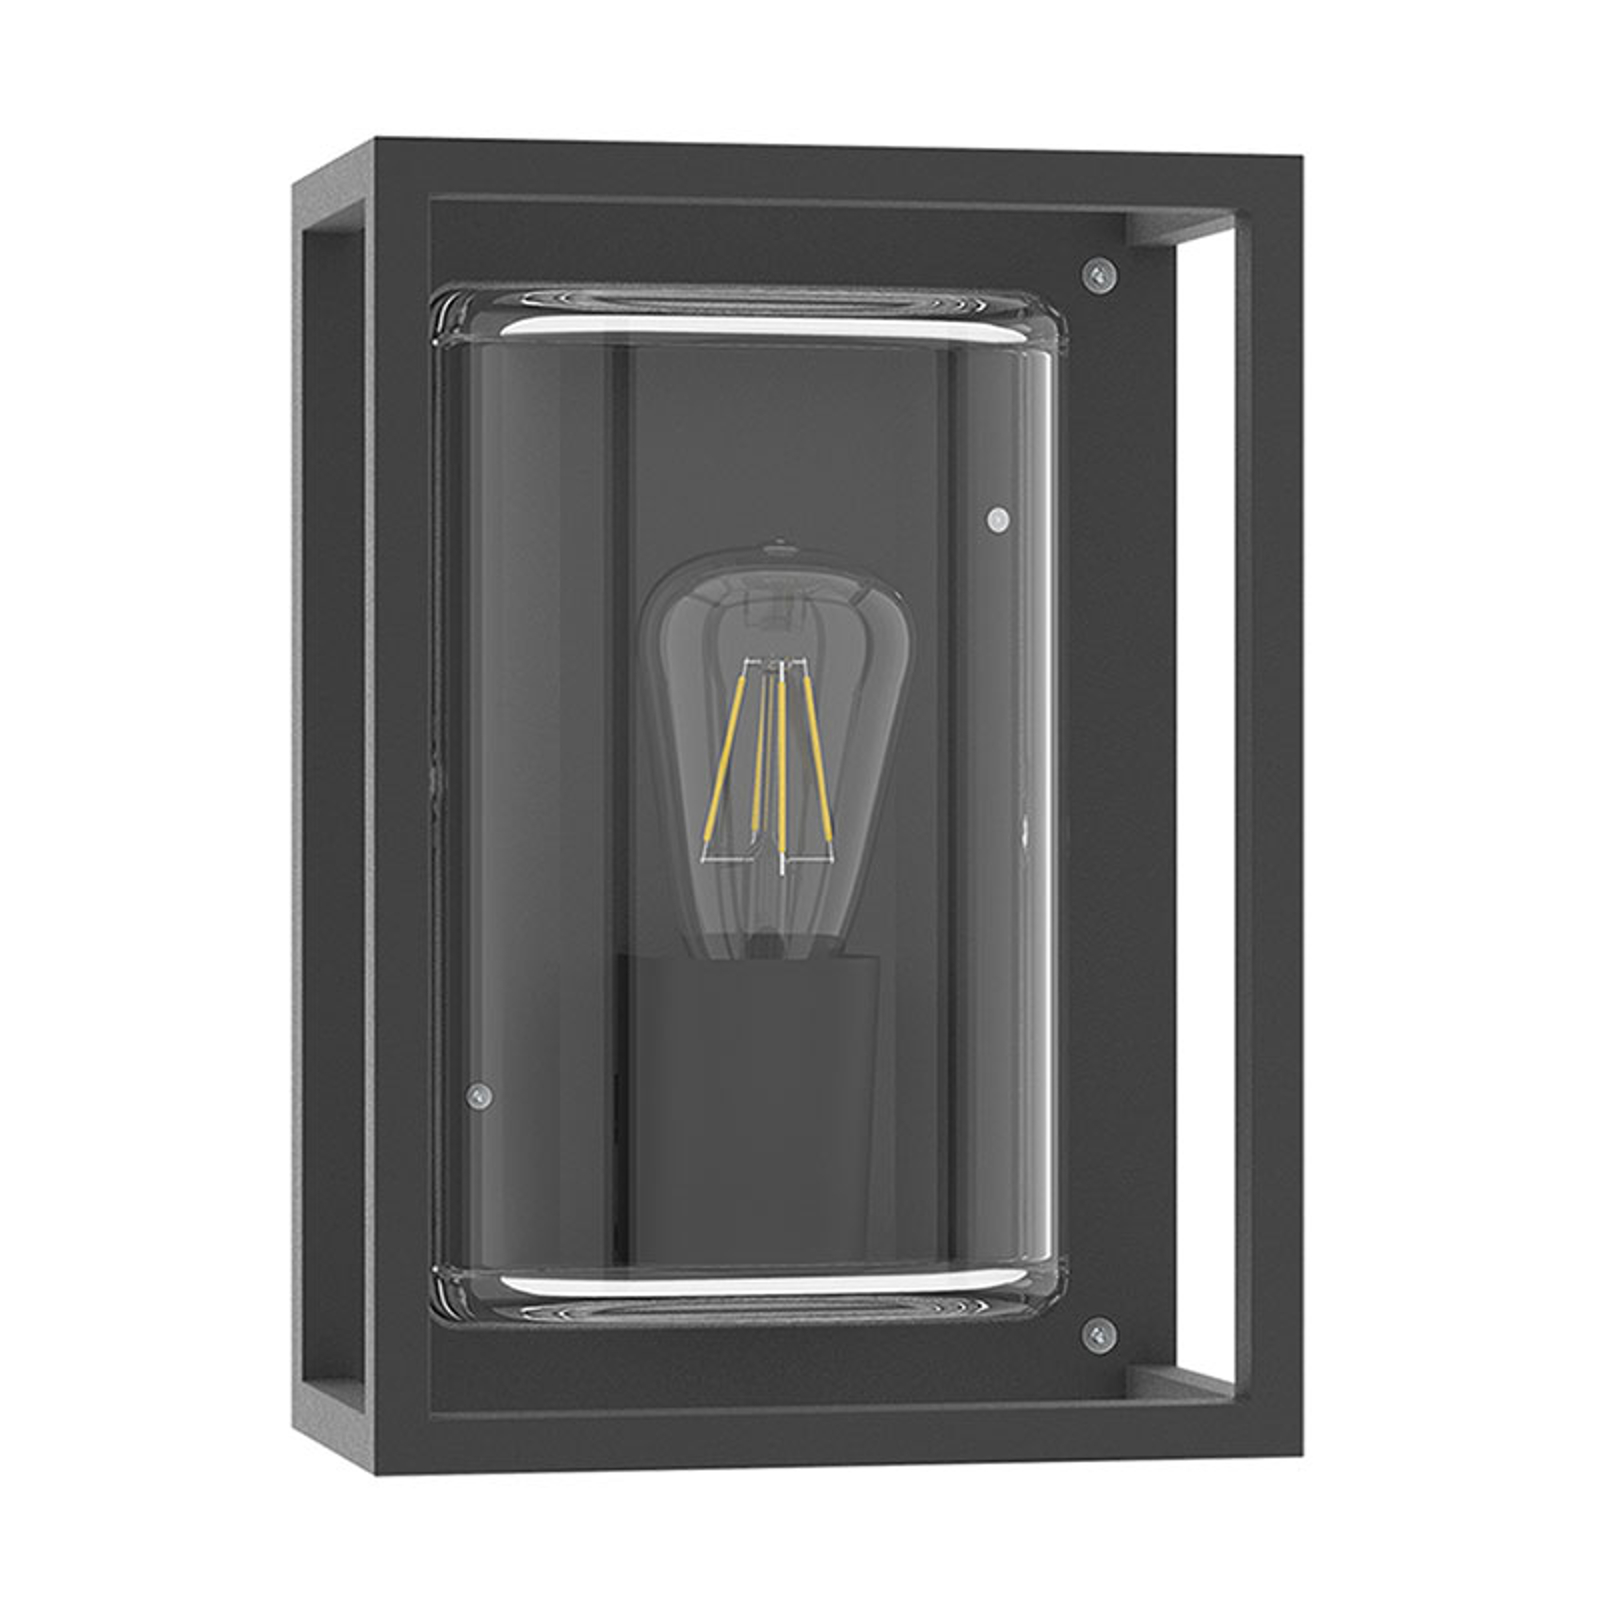 Applique extérieur Lanterna NK 27, E27, anthracite